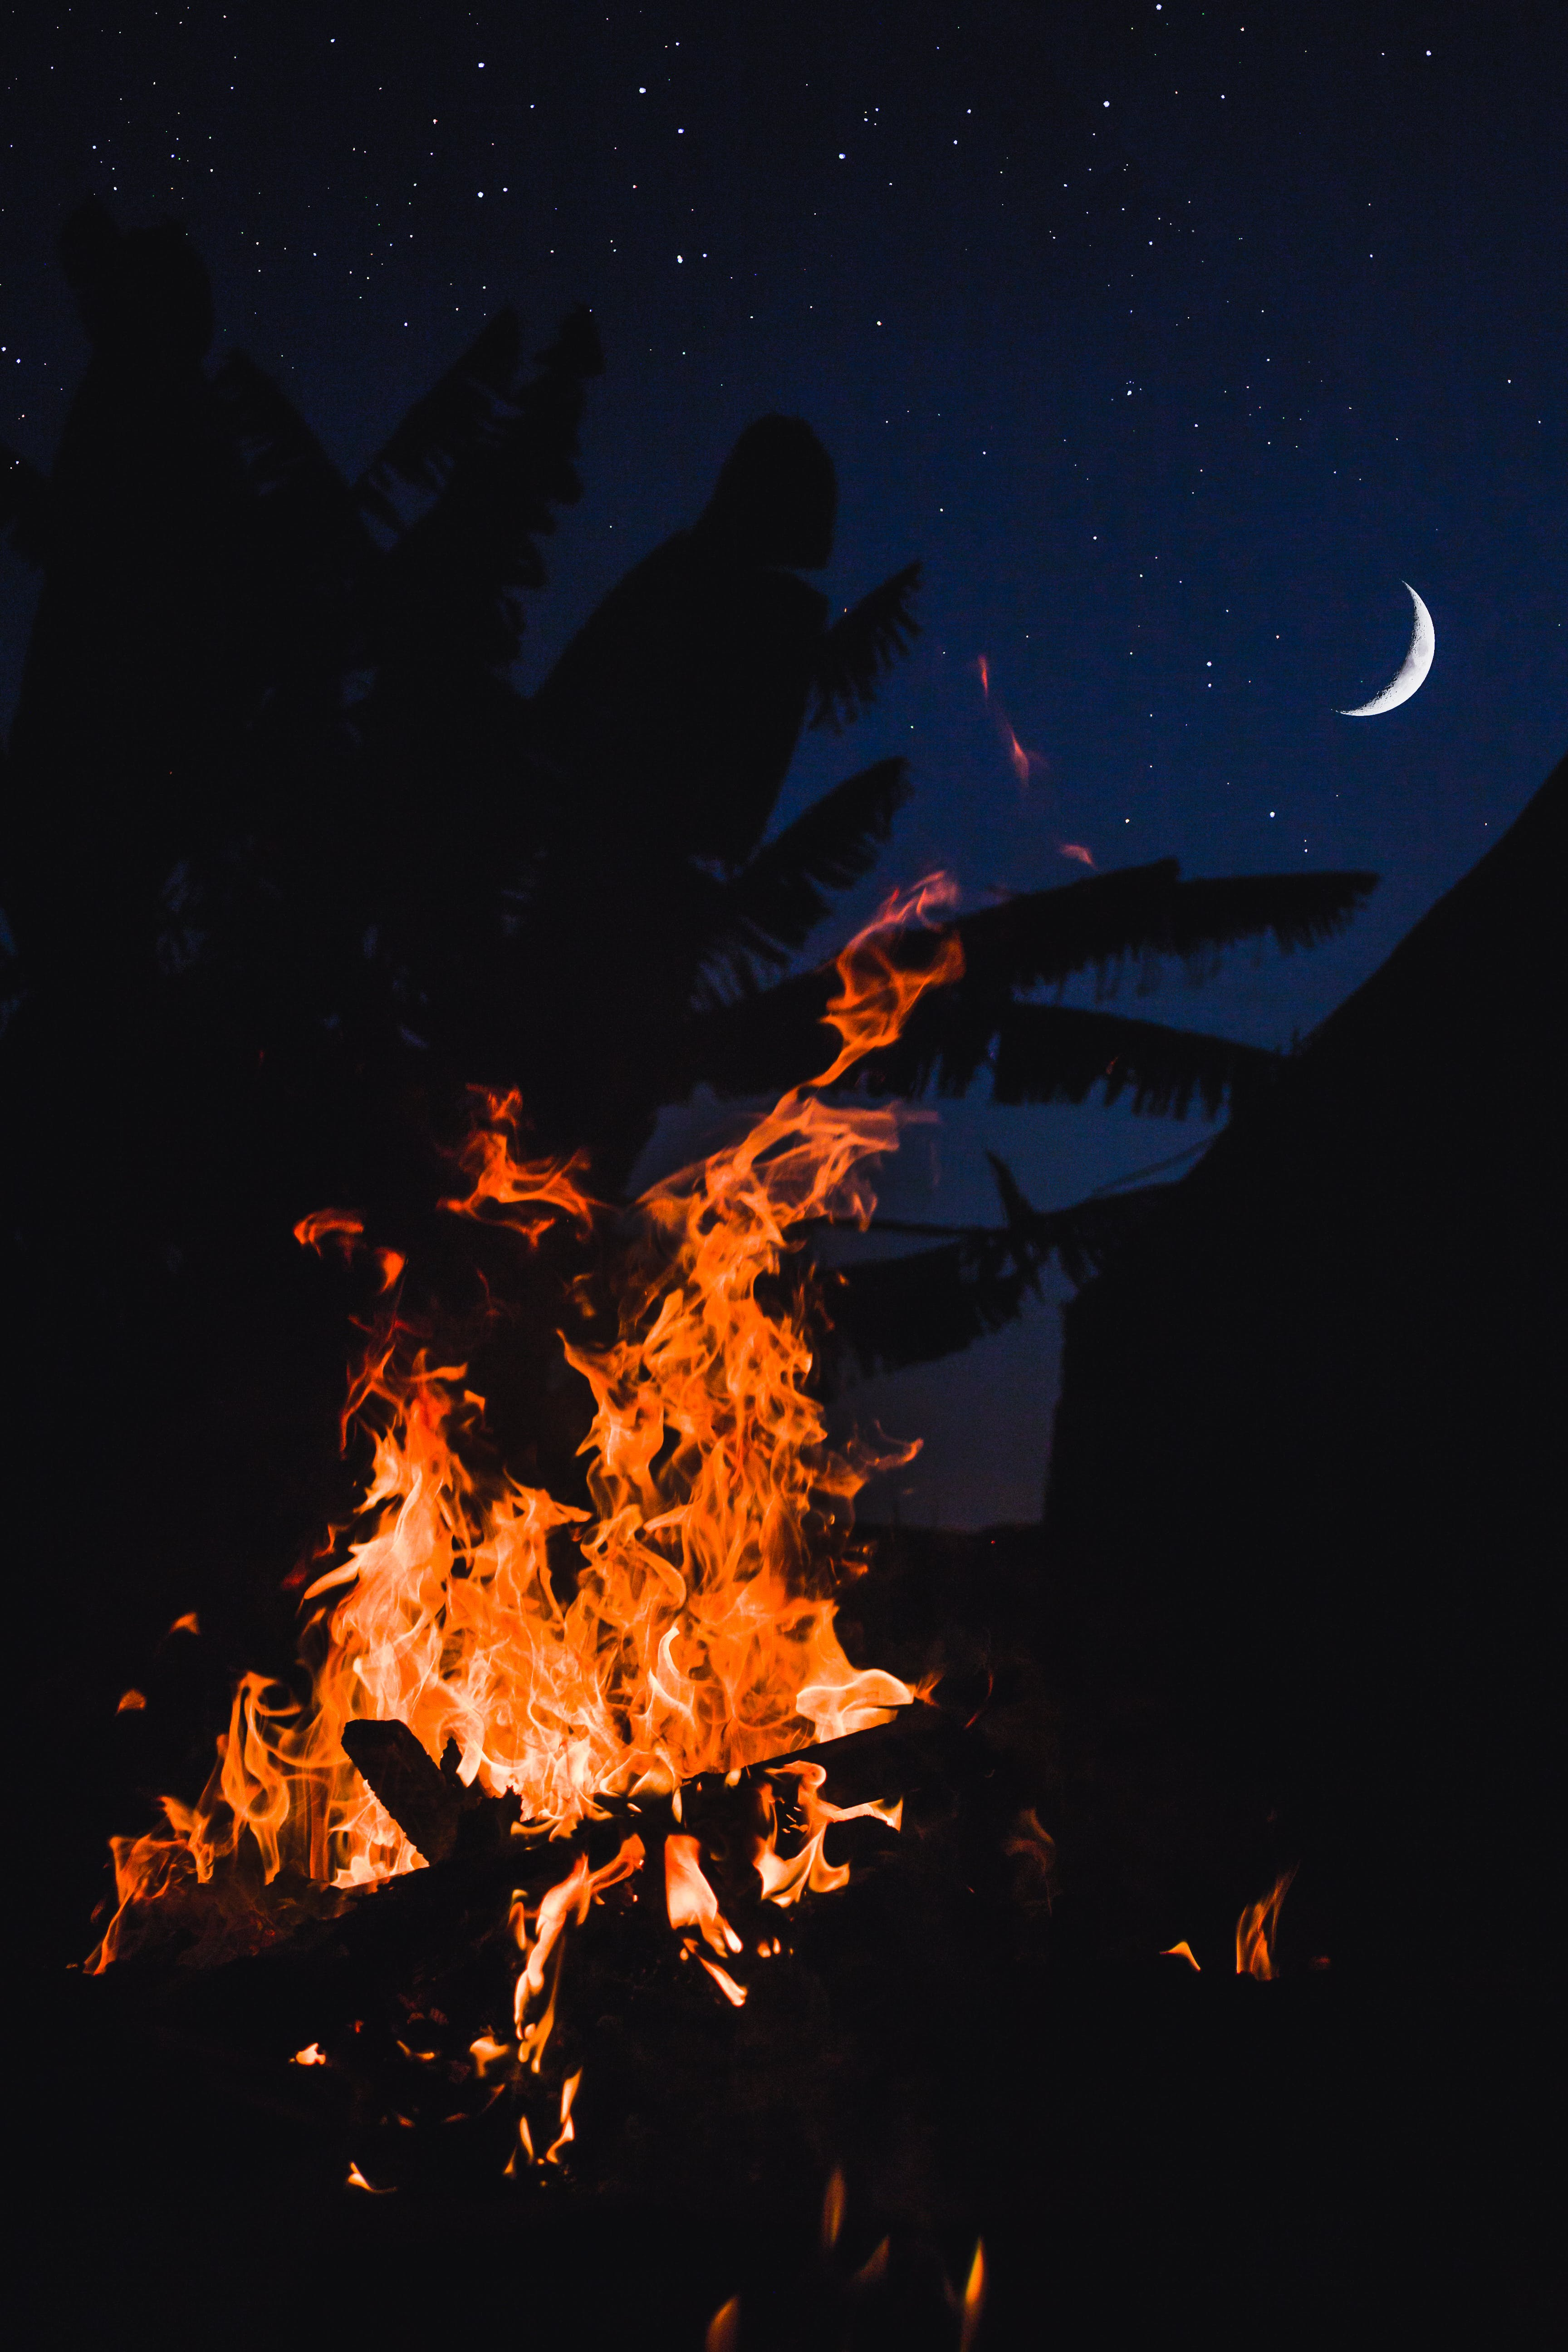 Bonfire Under Crescent Moon in the Sky